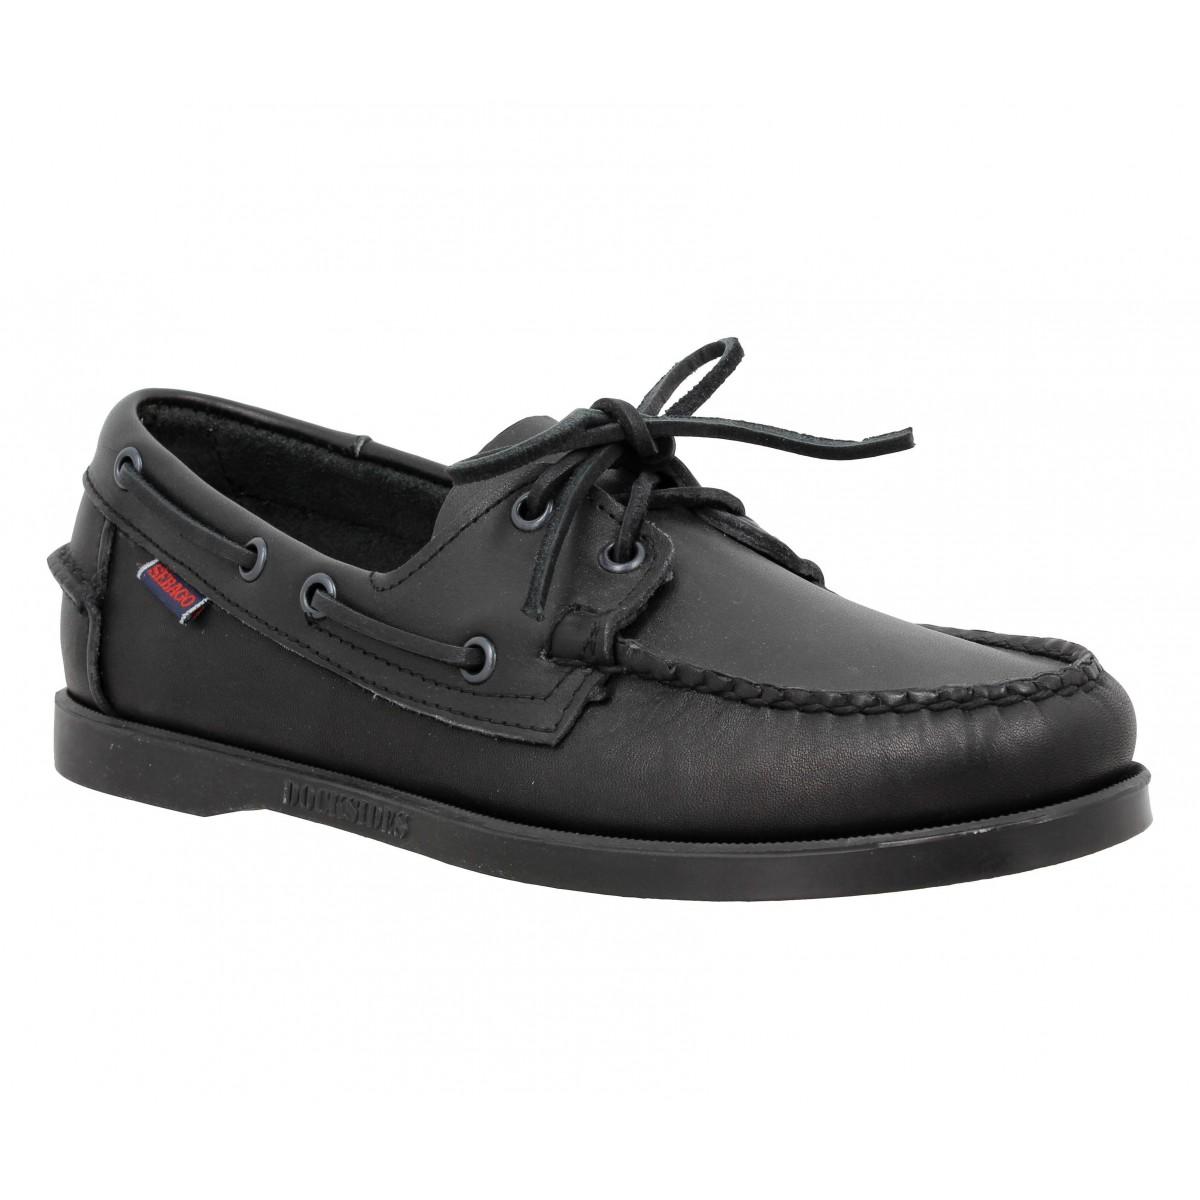 Chaussures bateaux SEBAGO Docksides cuir Homme Black